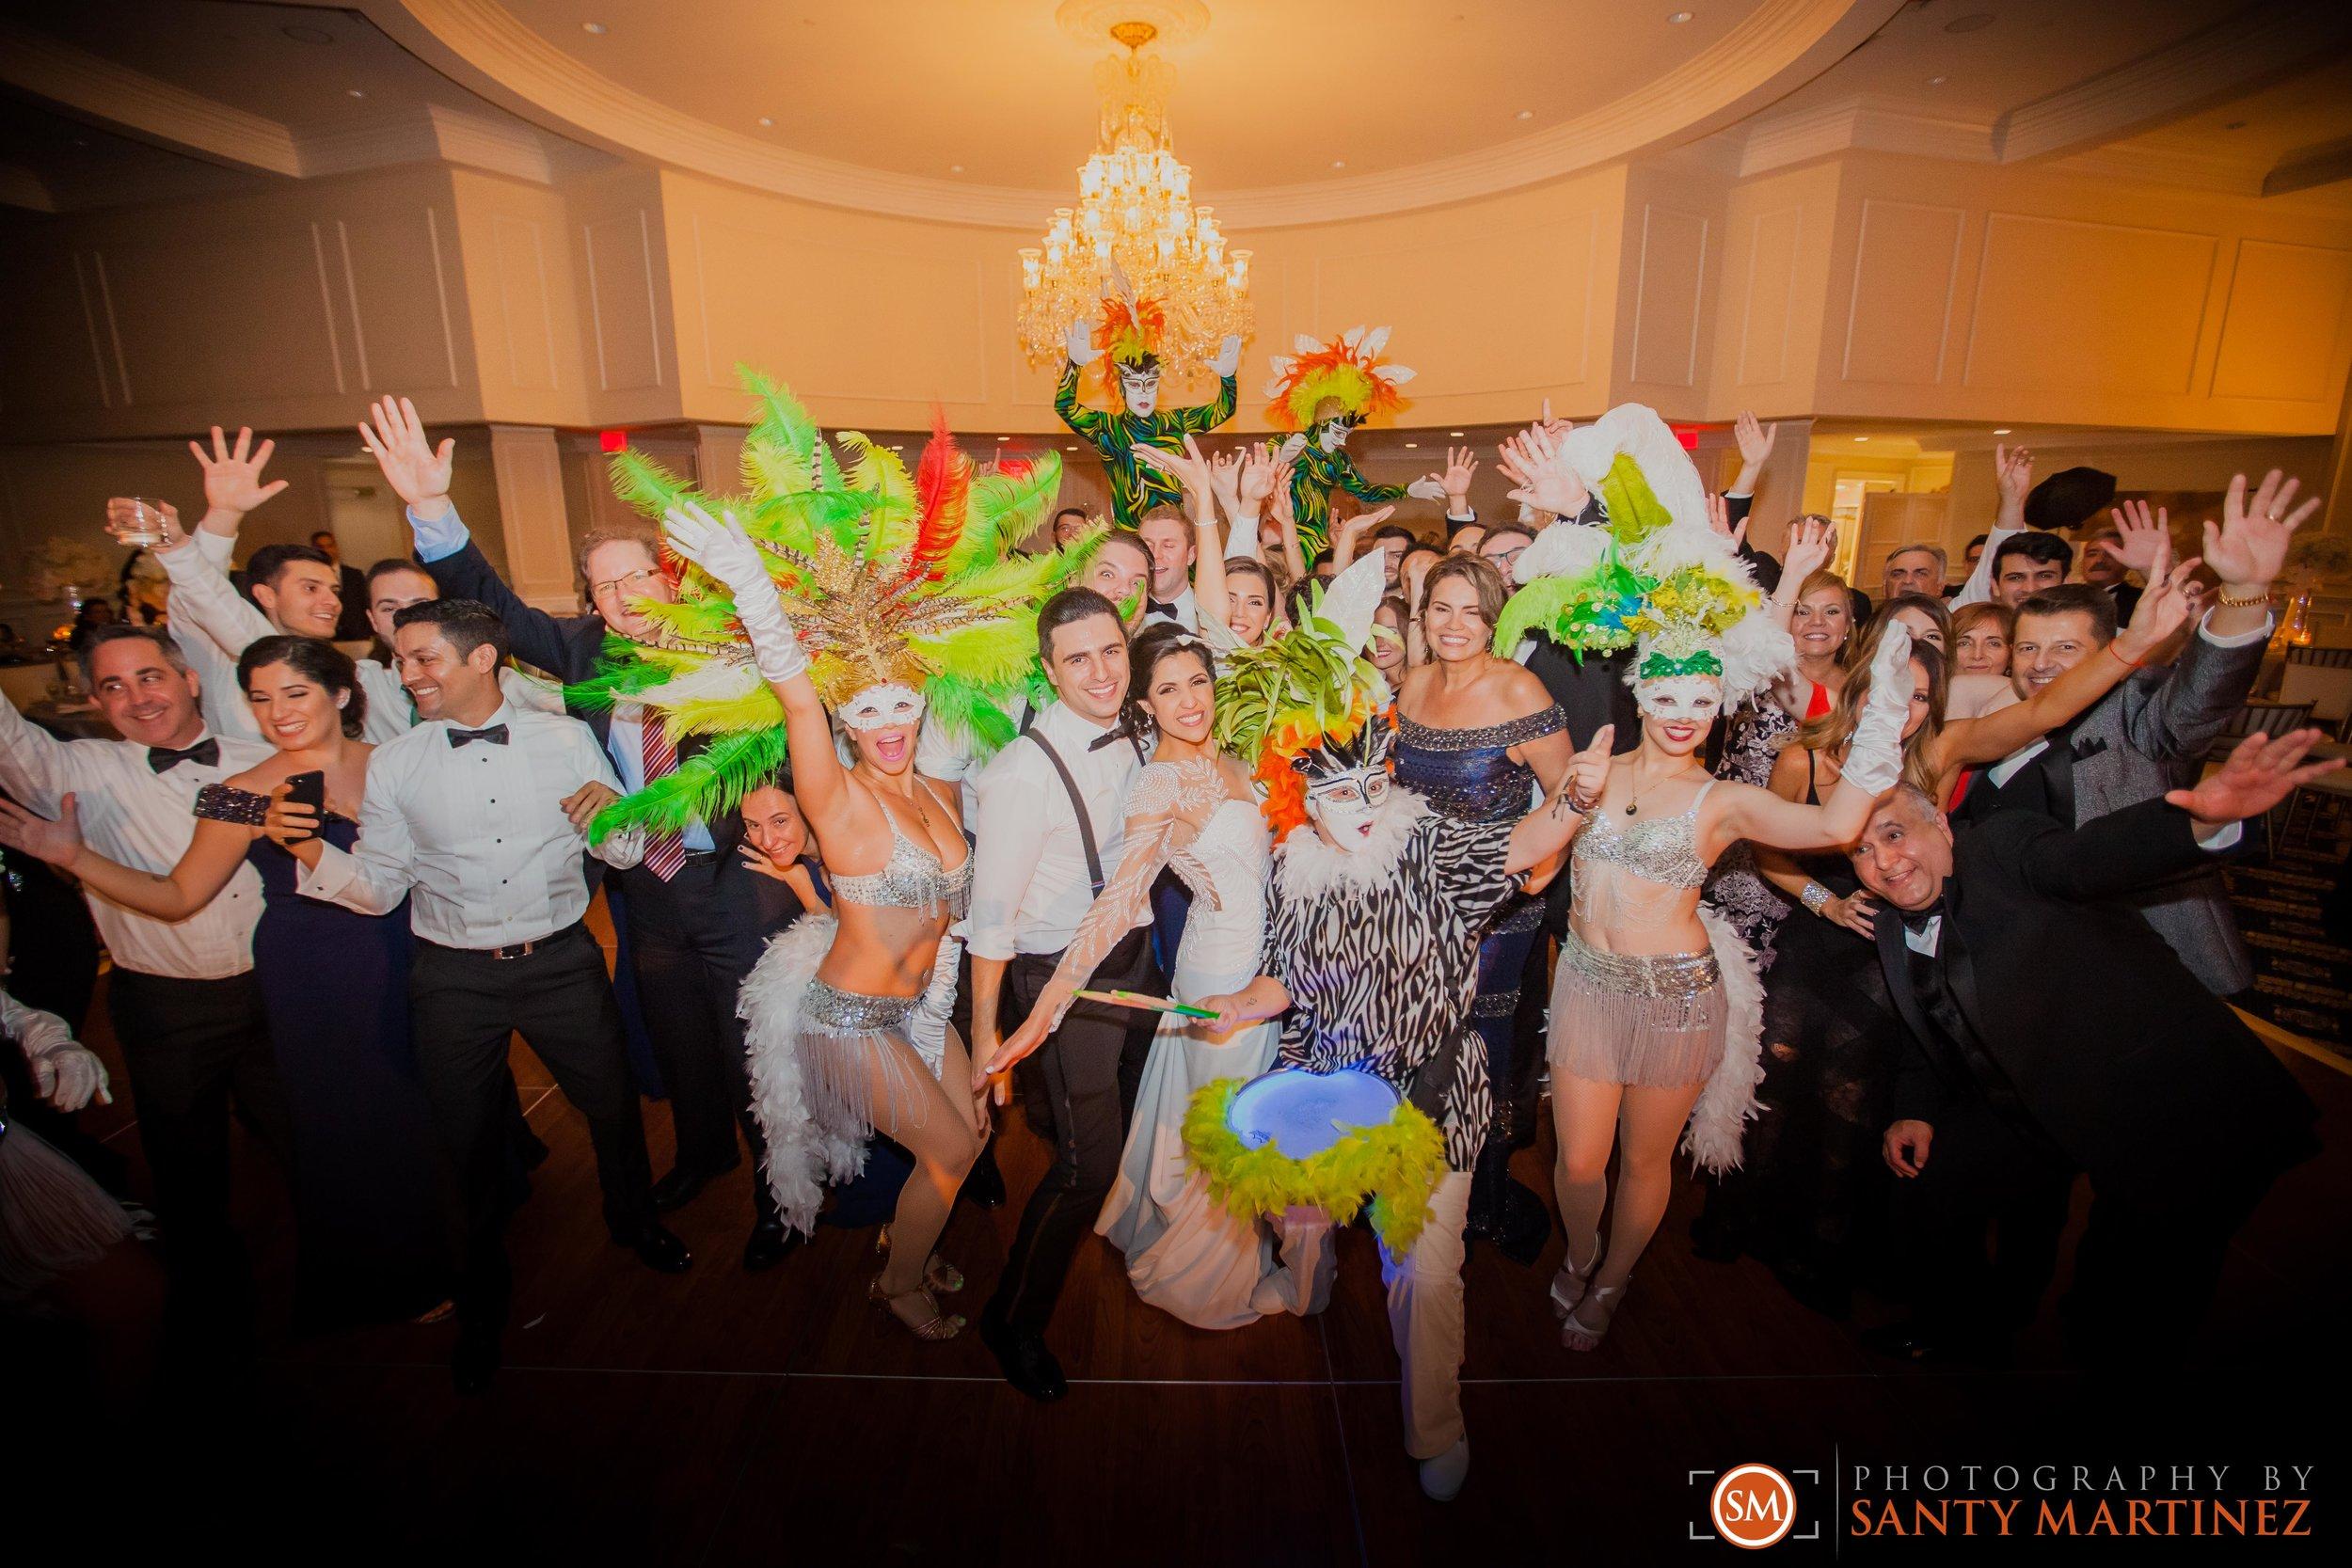 Wedding Trump National Doral Miami - Photography by Santy Martinez-46.jpg